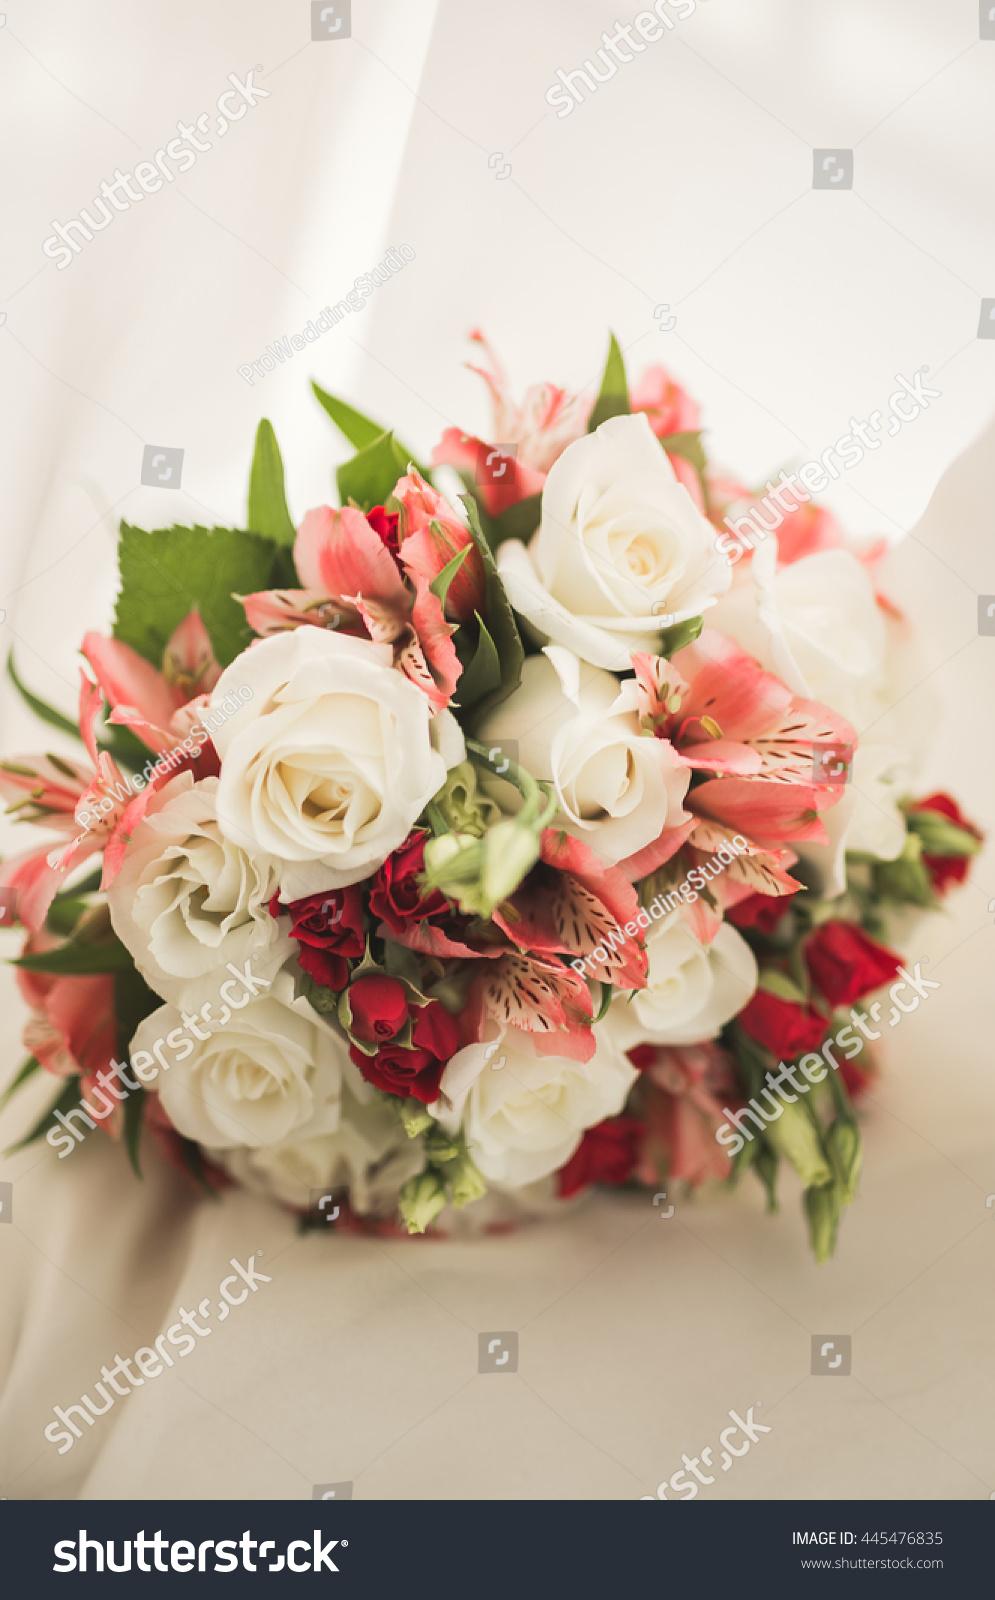 Wedding perfect bridal bouquet different flowers stock photo wedding perfect bridal bouquet of different flowers izmirmasajfo Gallery